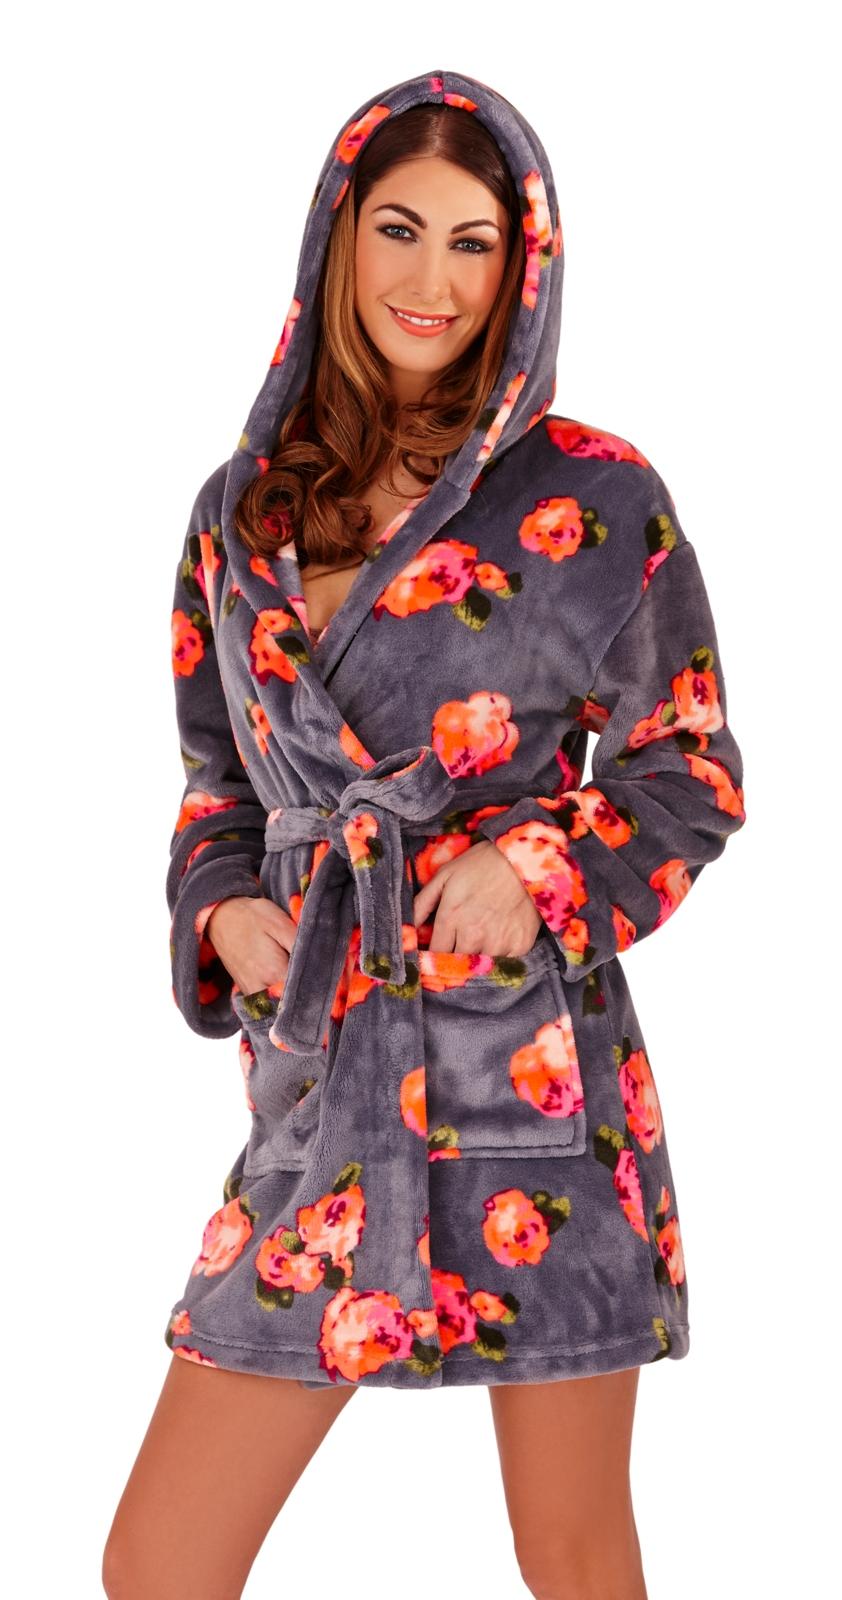 5ece0cc02c Womens Short Hooded Dressing Gown Bath Robe Housecoat + Belt Ladies ...